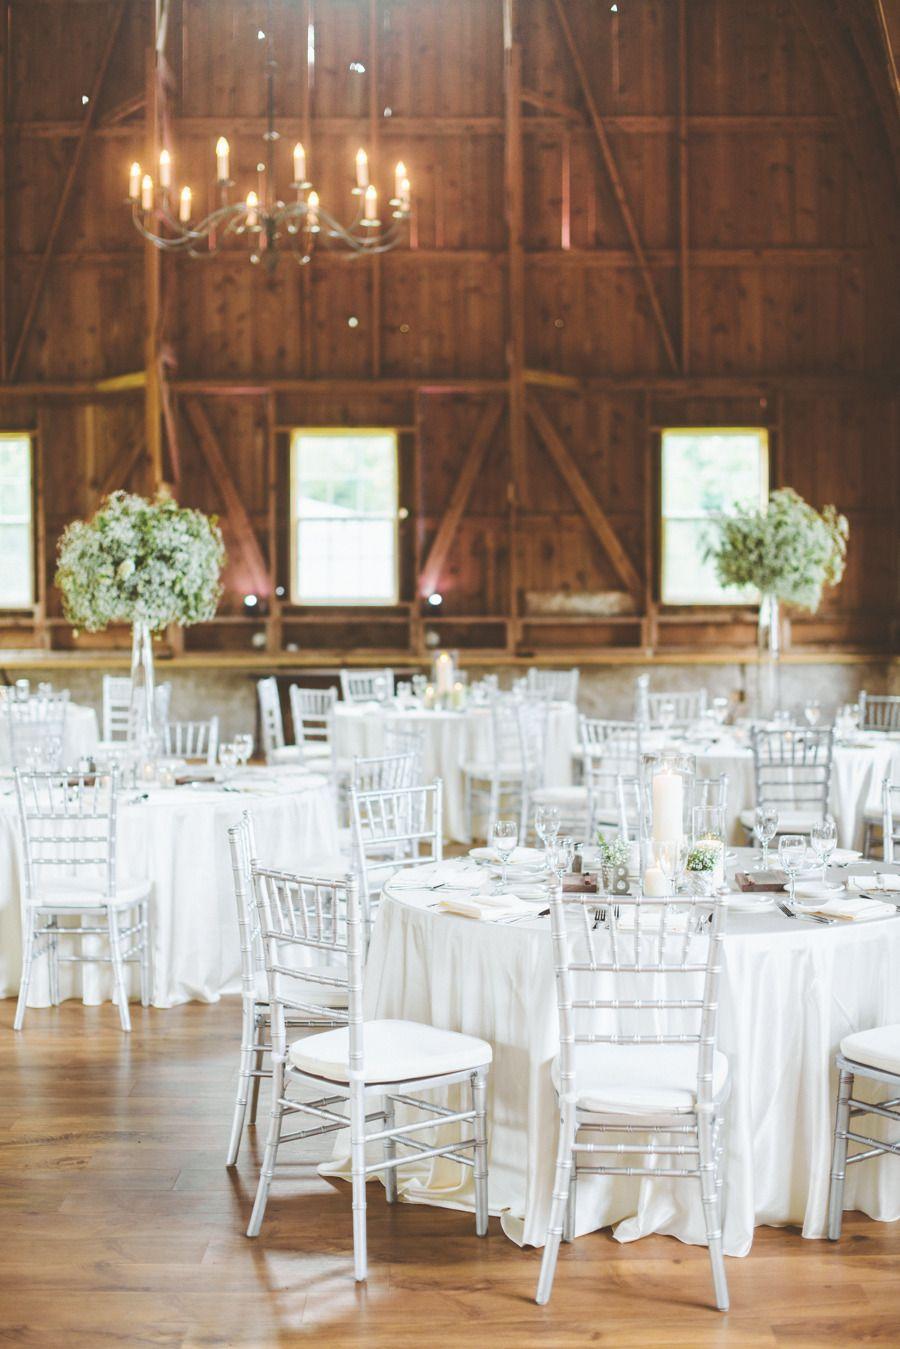 New York Glamour in a Wisconsin Barn Wedding | Barn ...